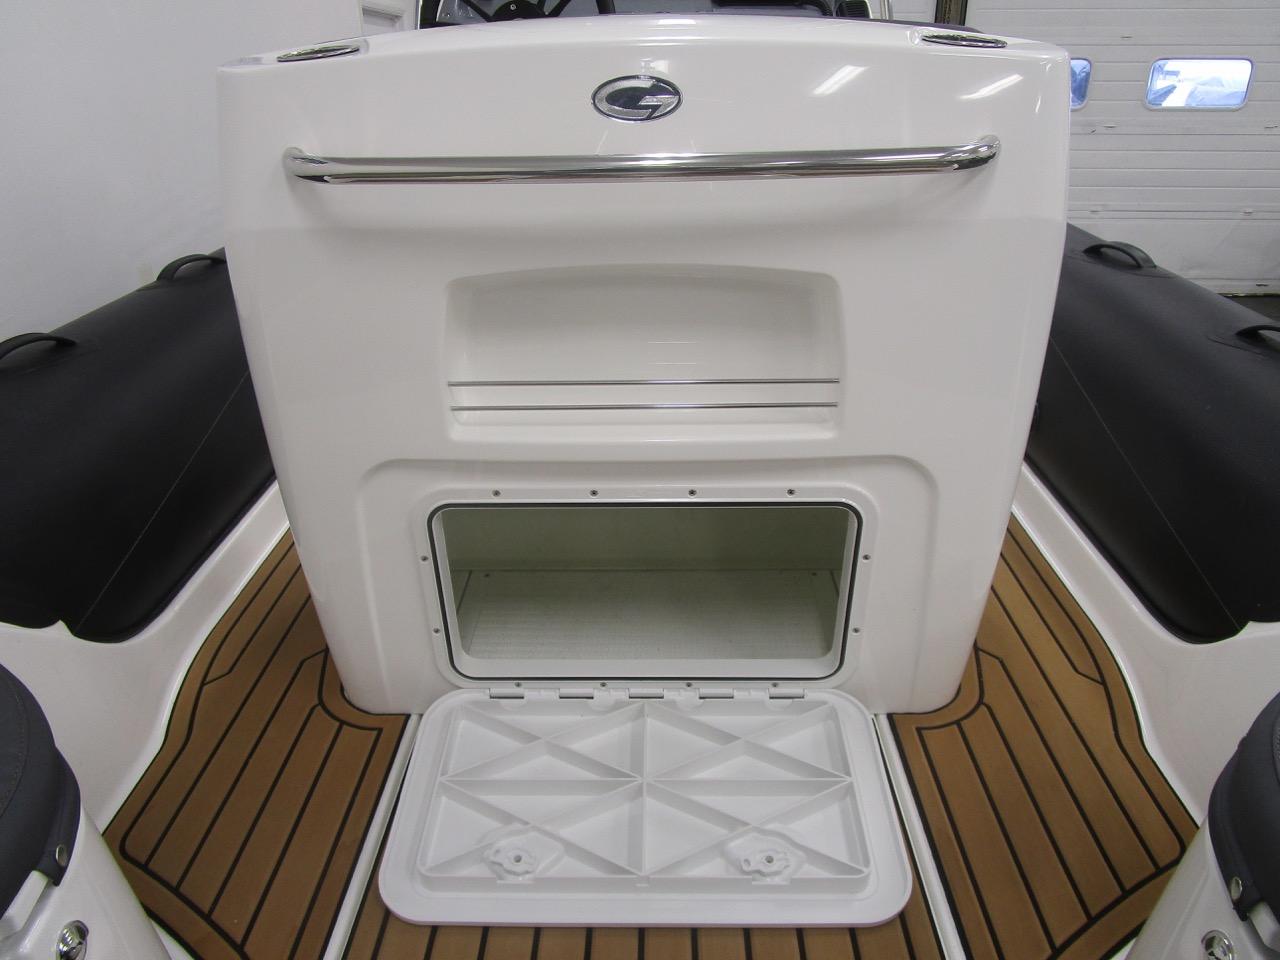 Grand RIB Golden Line G650 rear of helm seat locker open